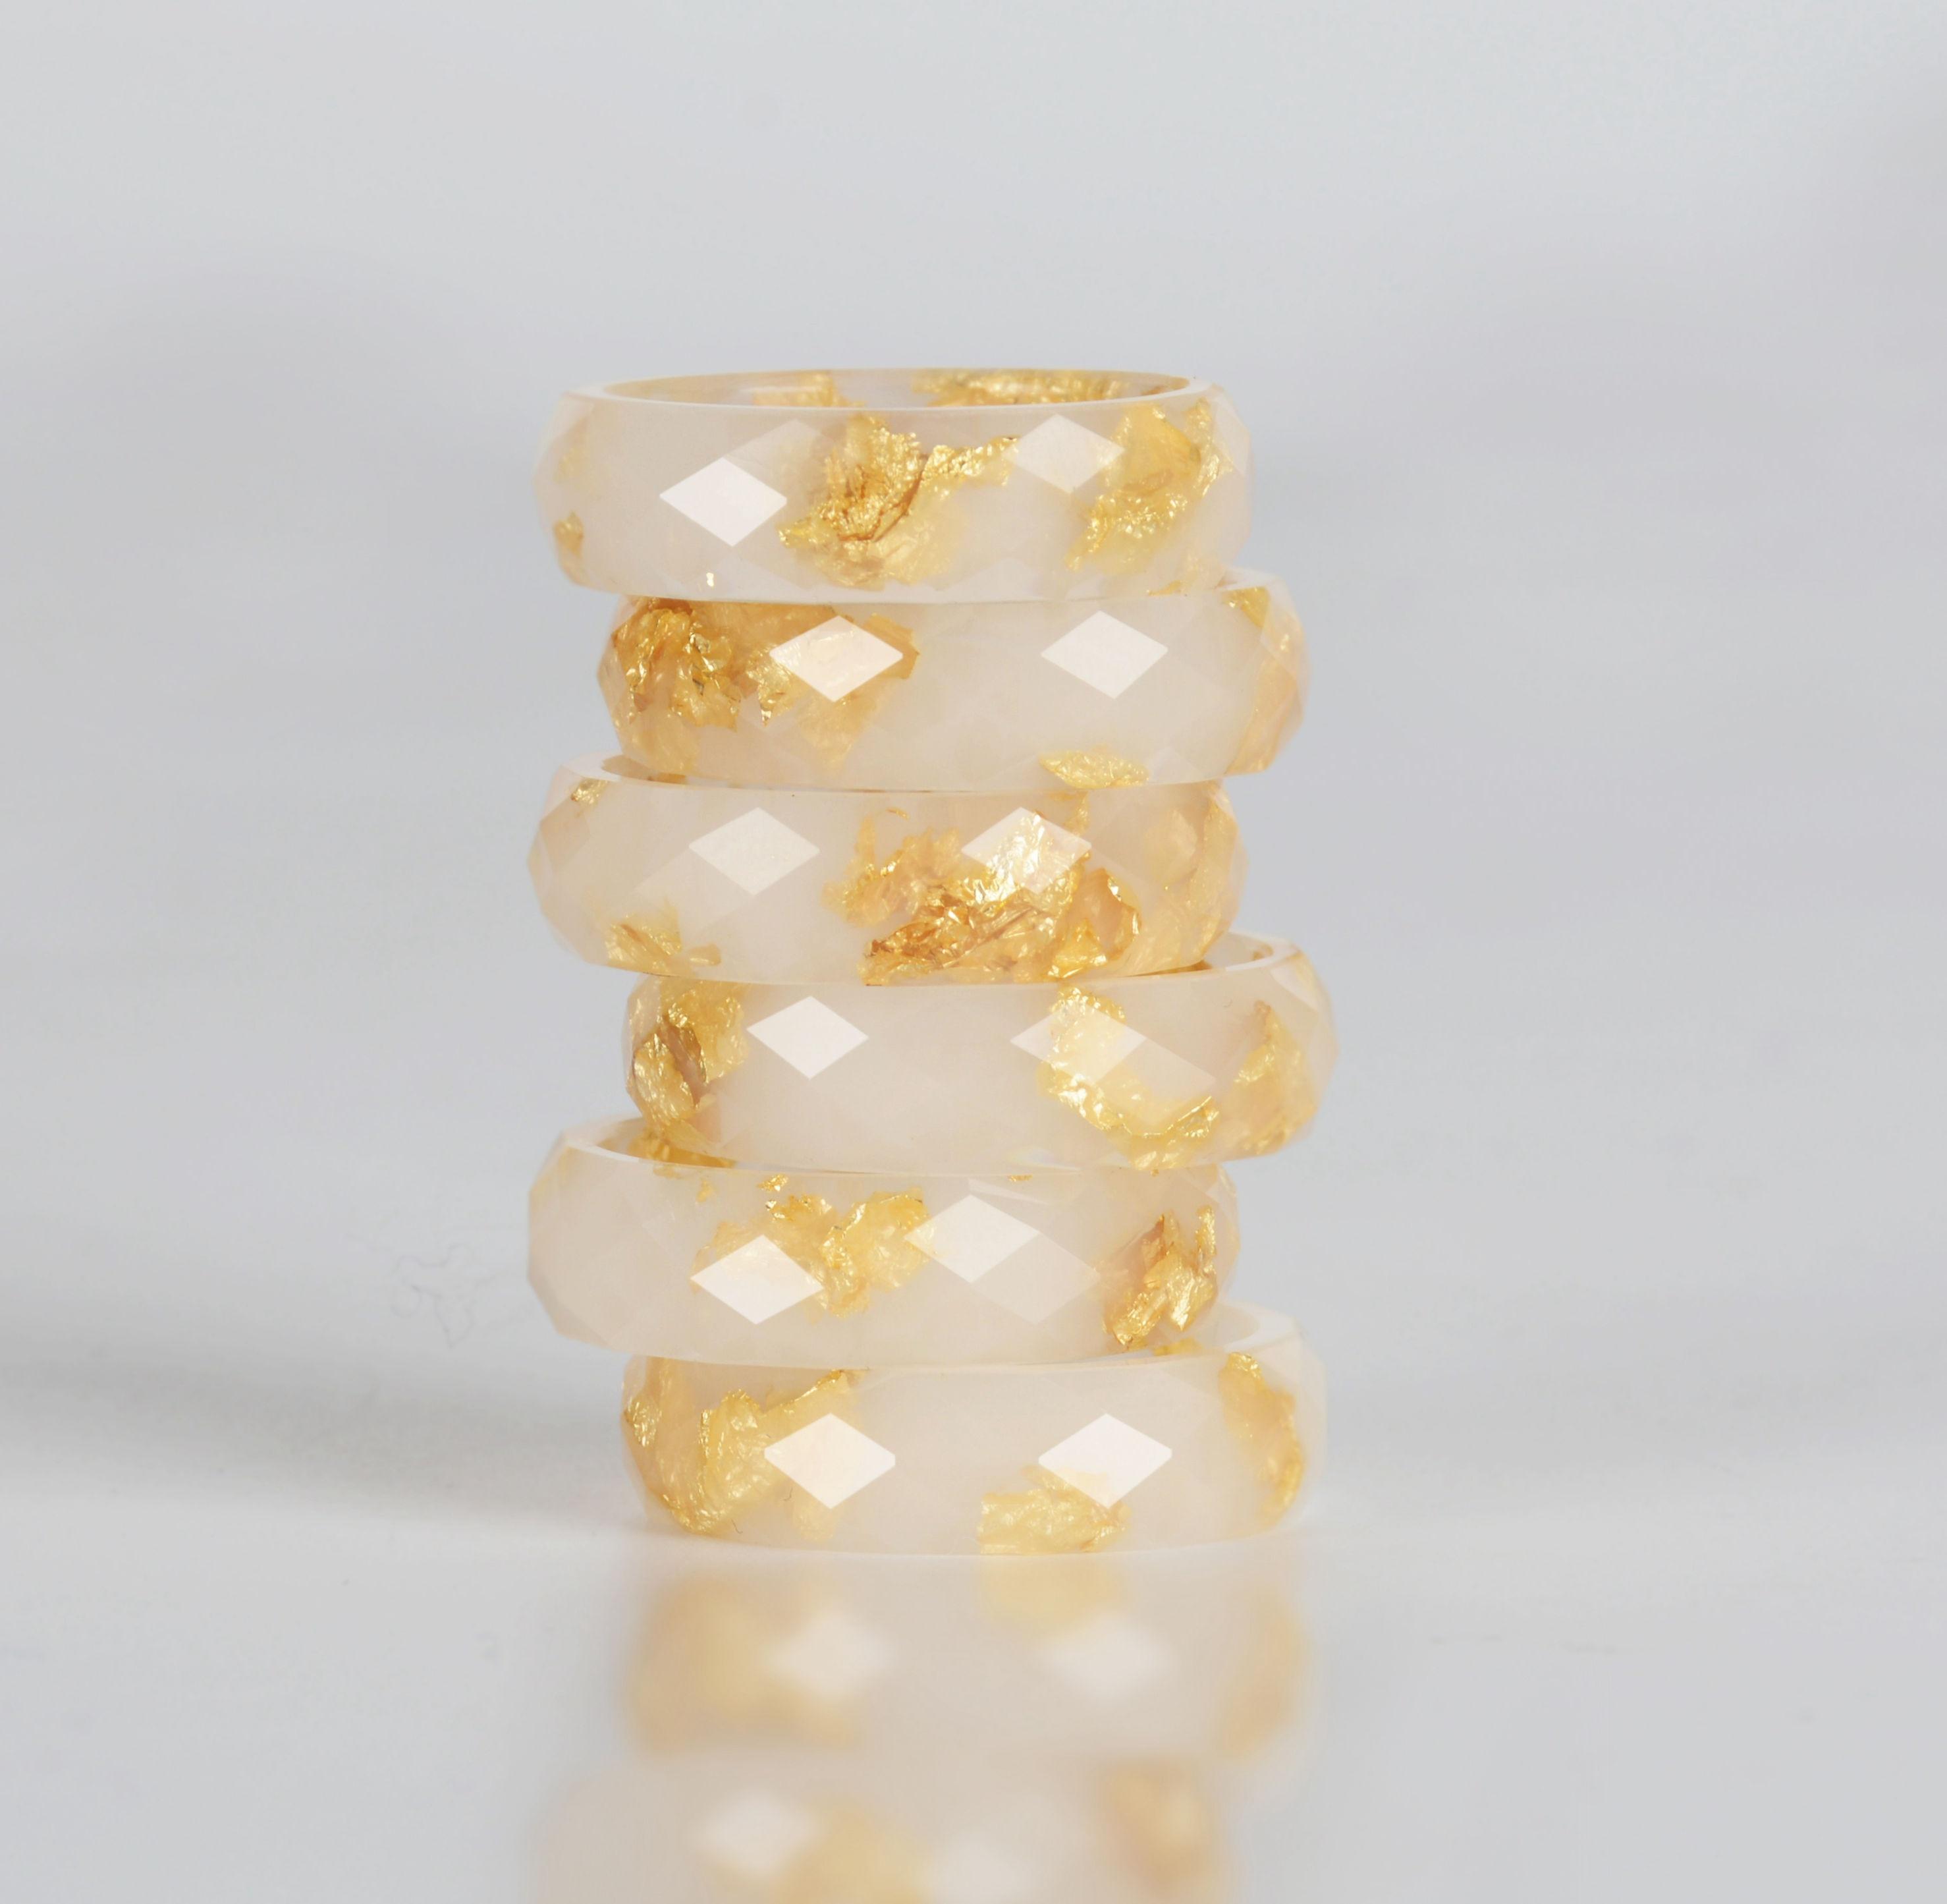 Hcca048b7ad134dde95c7e4880edec51cI - Crystalic Resin Ring